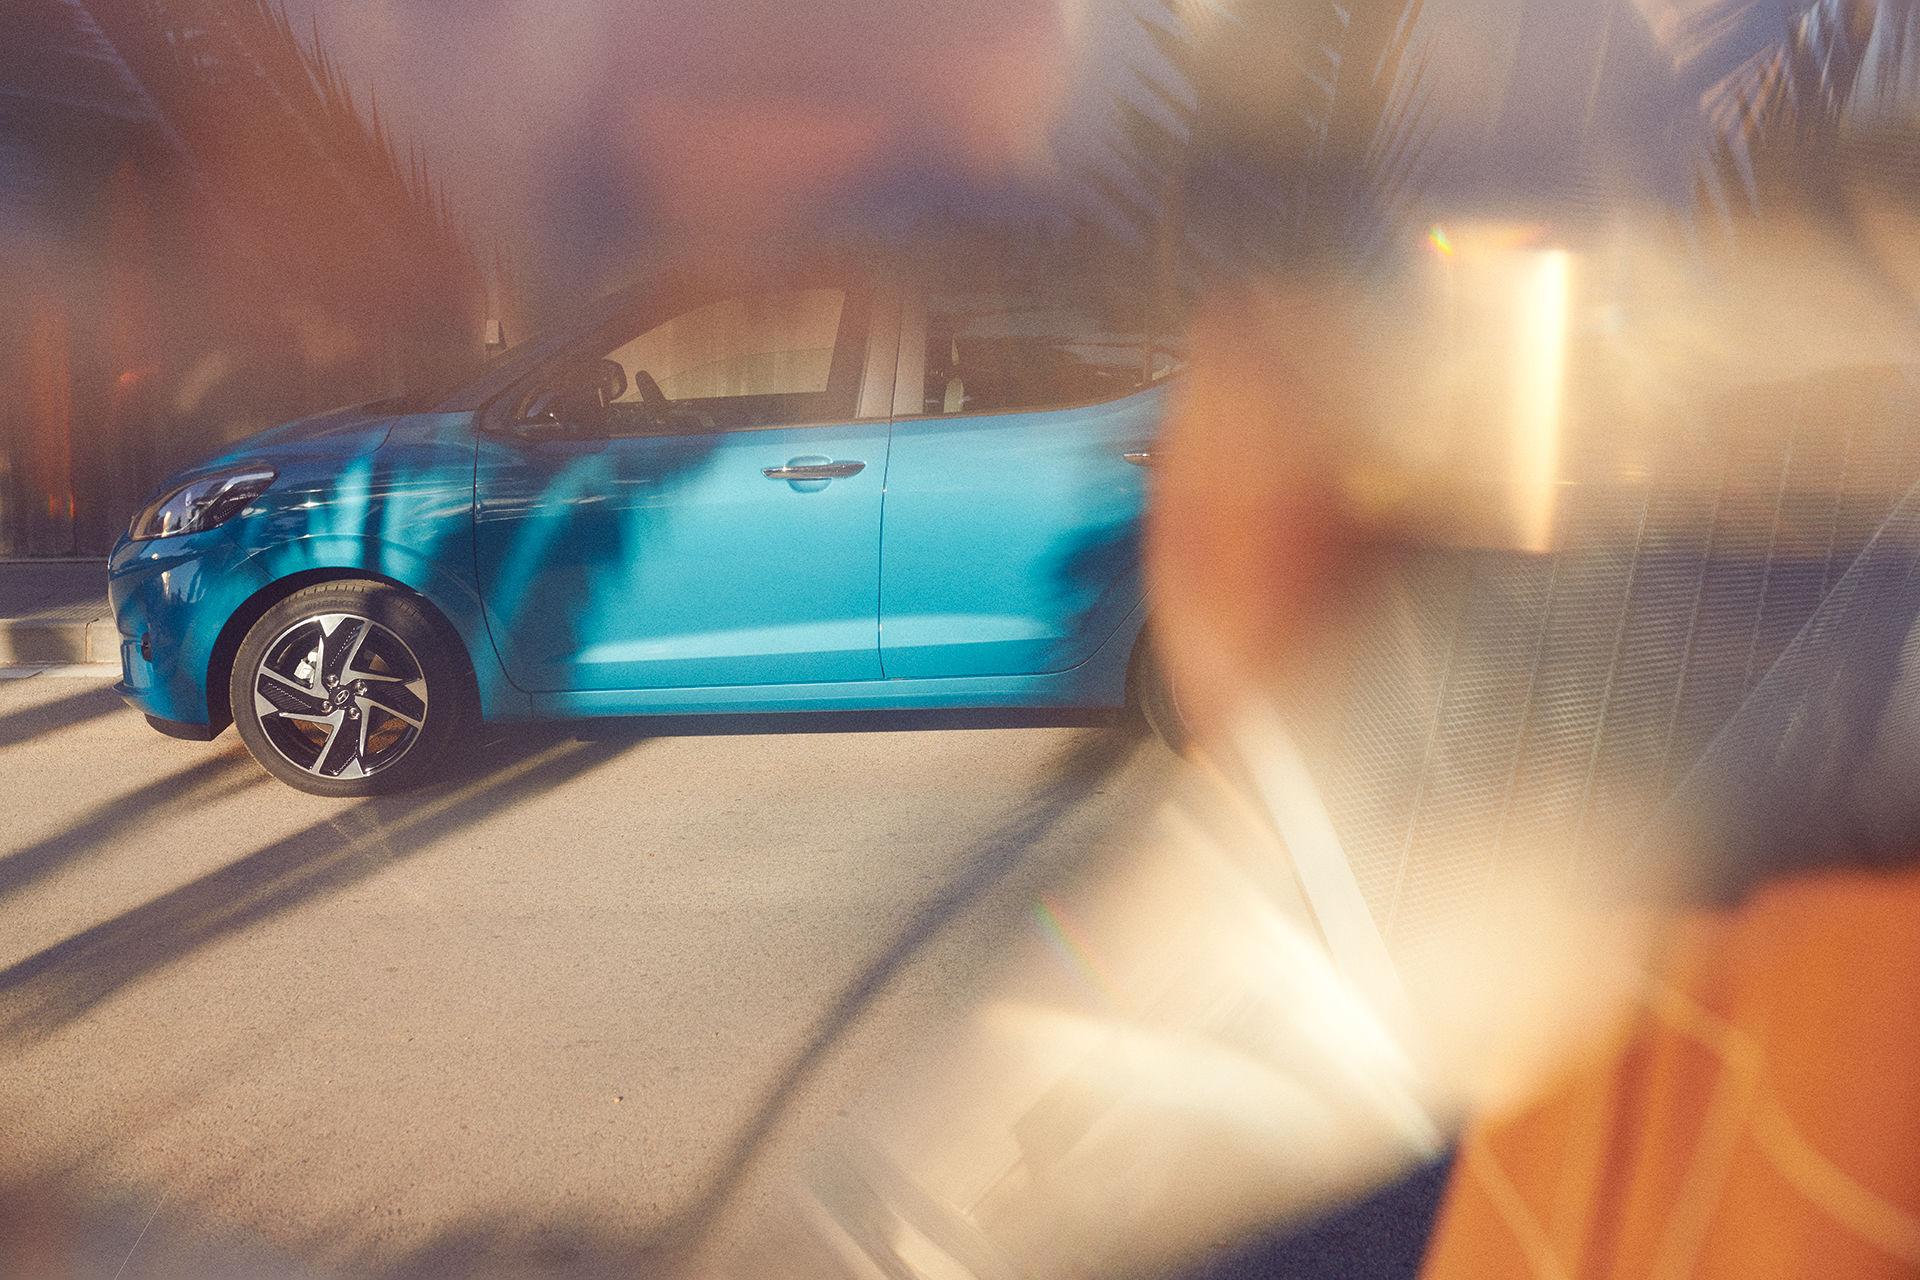 All New Hyundai i10 Campaign shot by BAM I Part #1